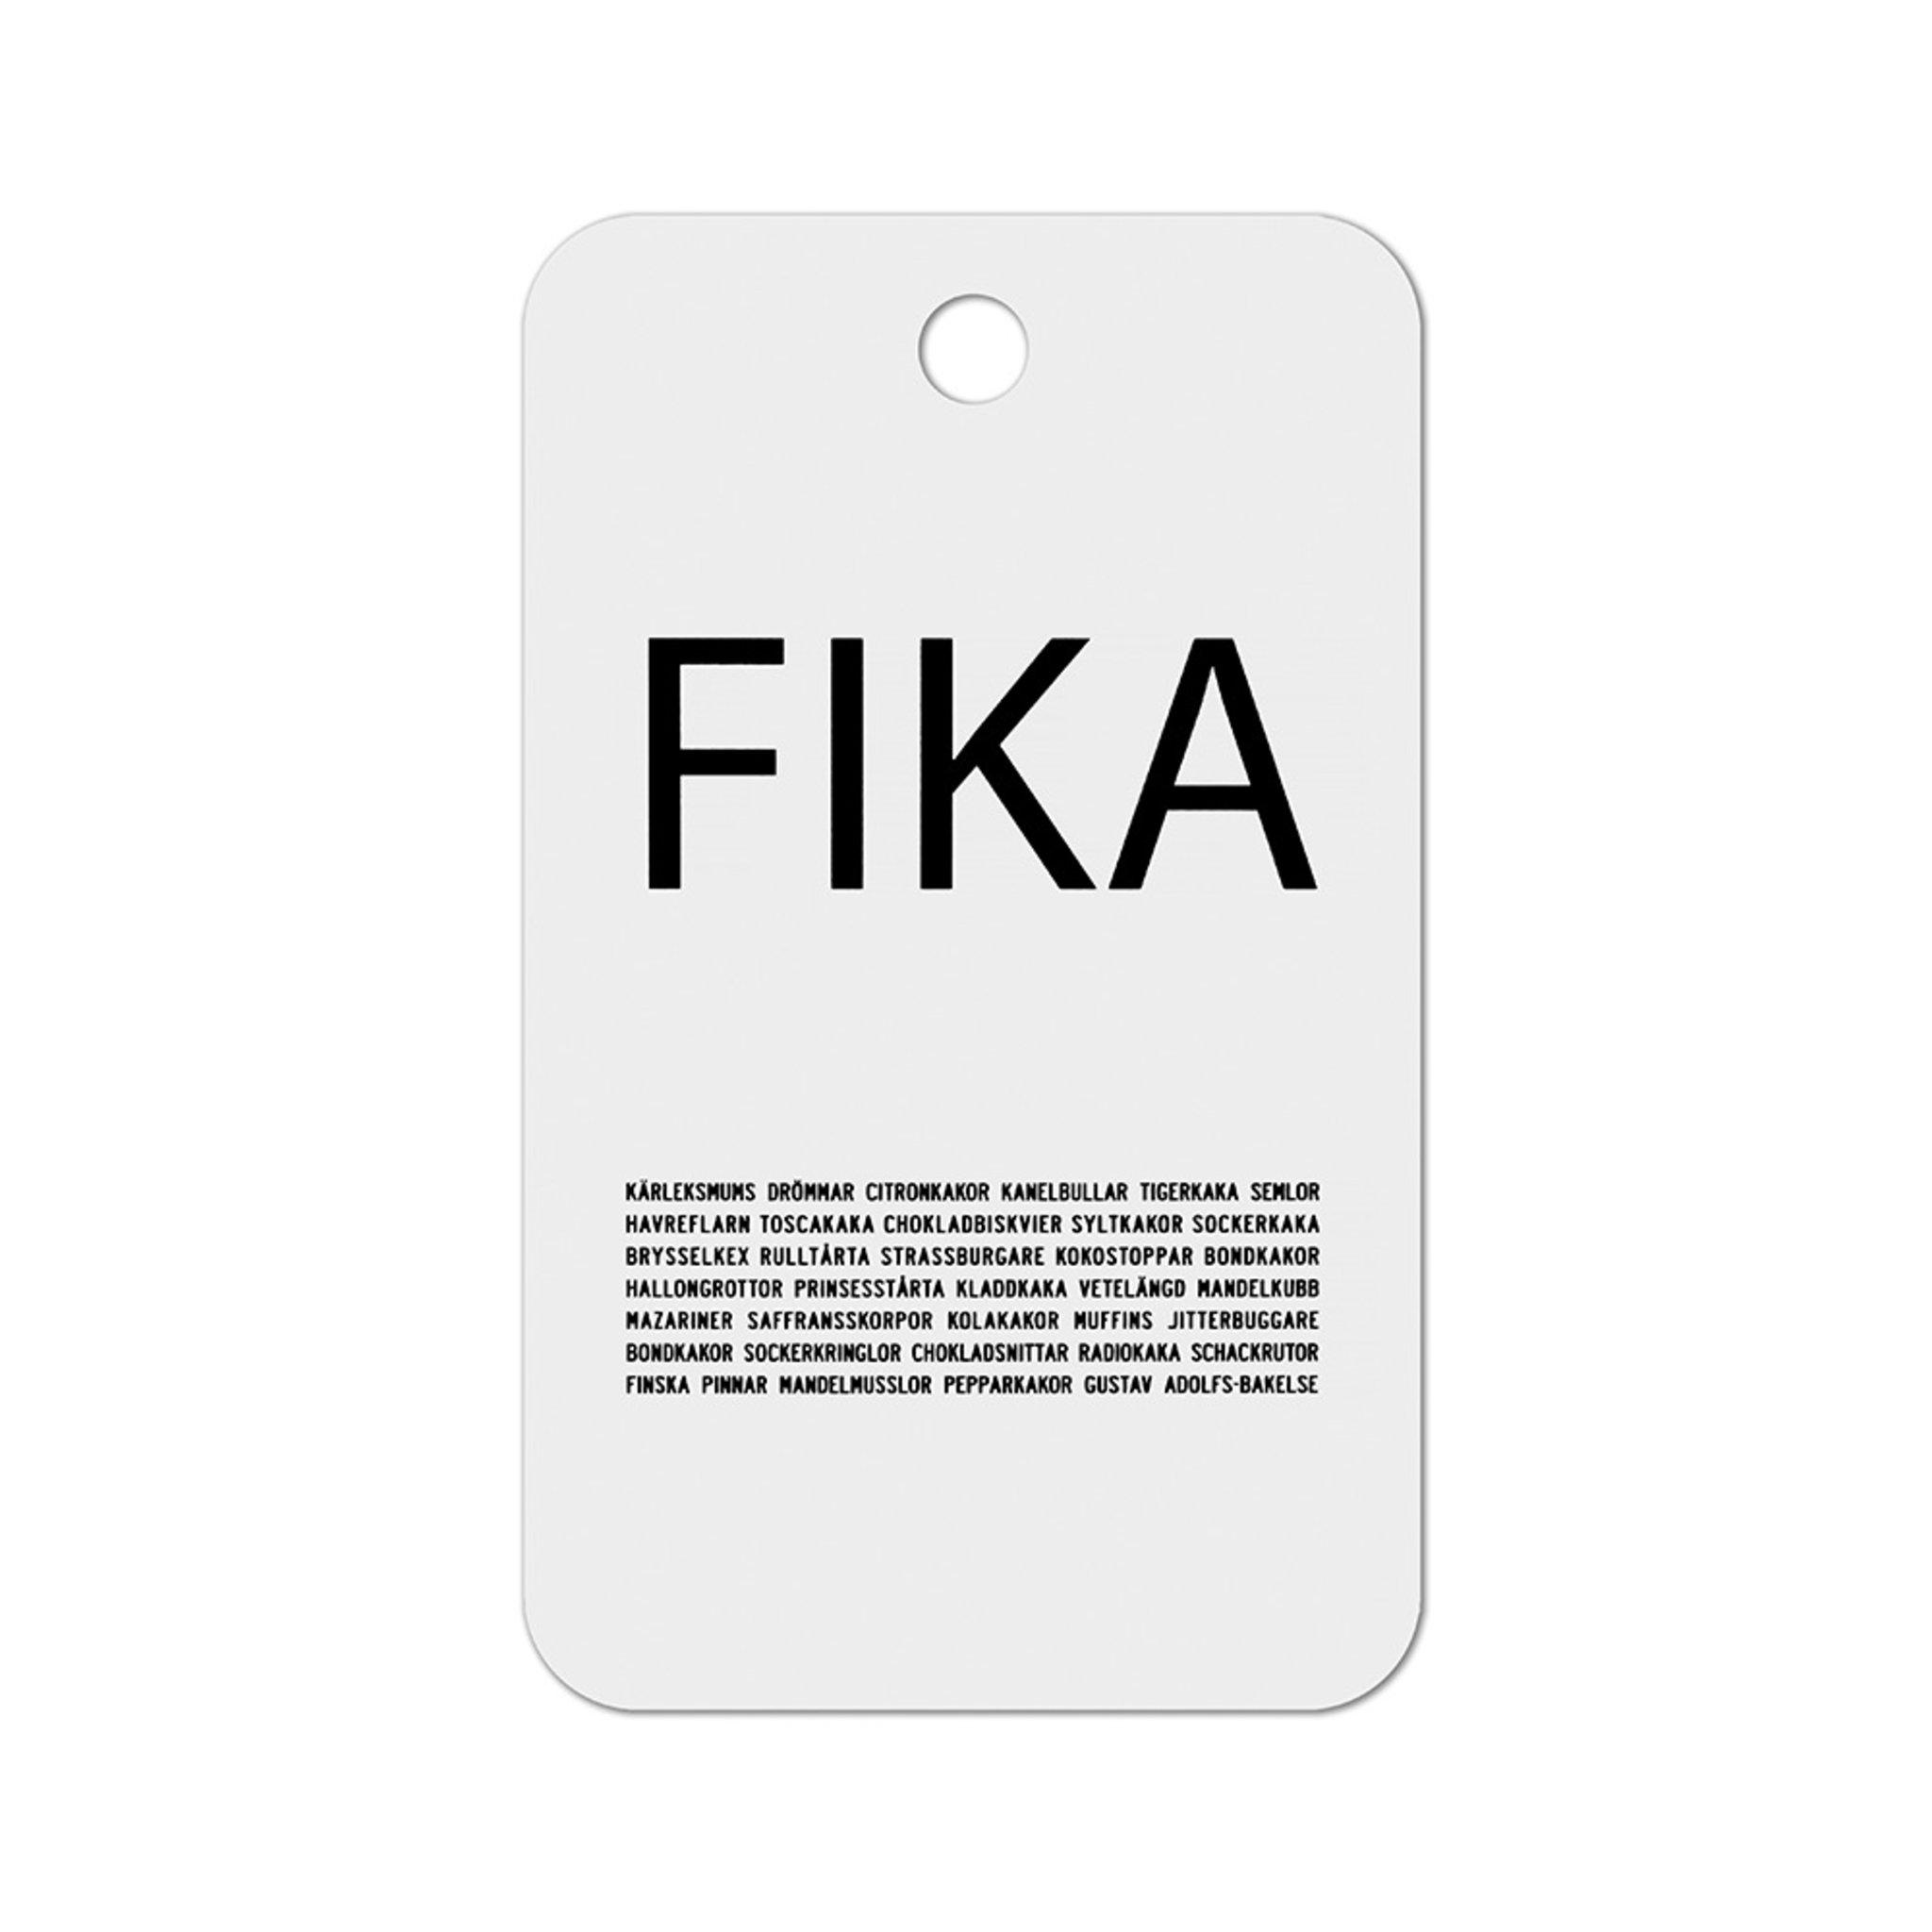 Skärbräda FIKA 34x20cm, 34X20 CM